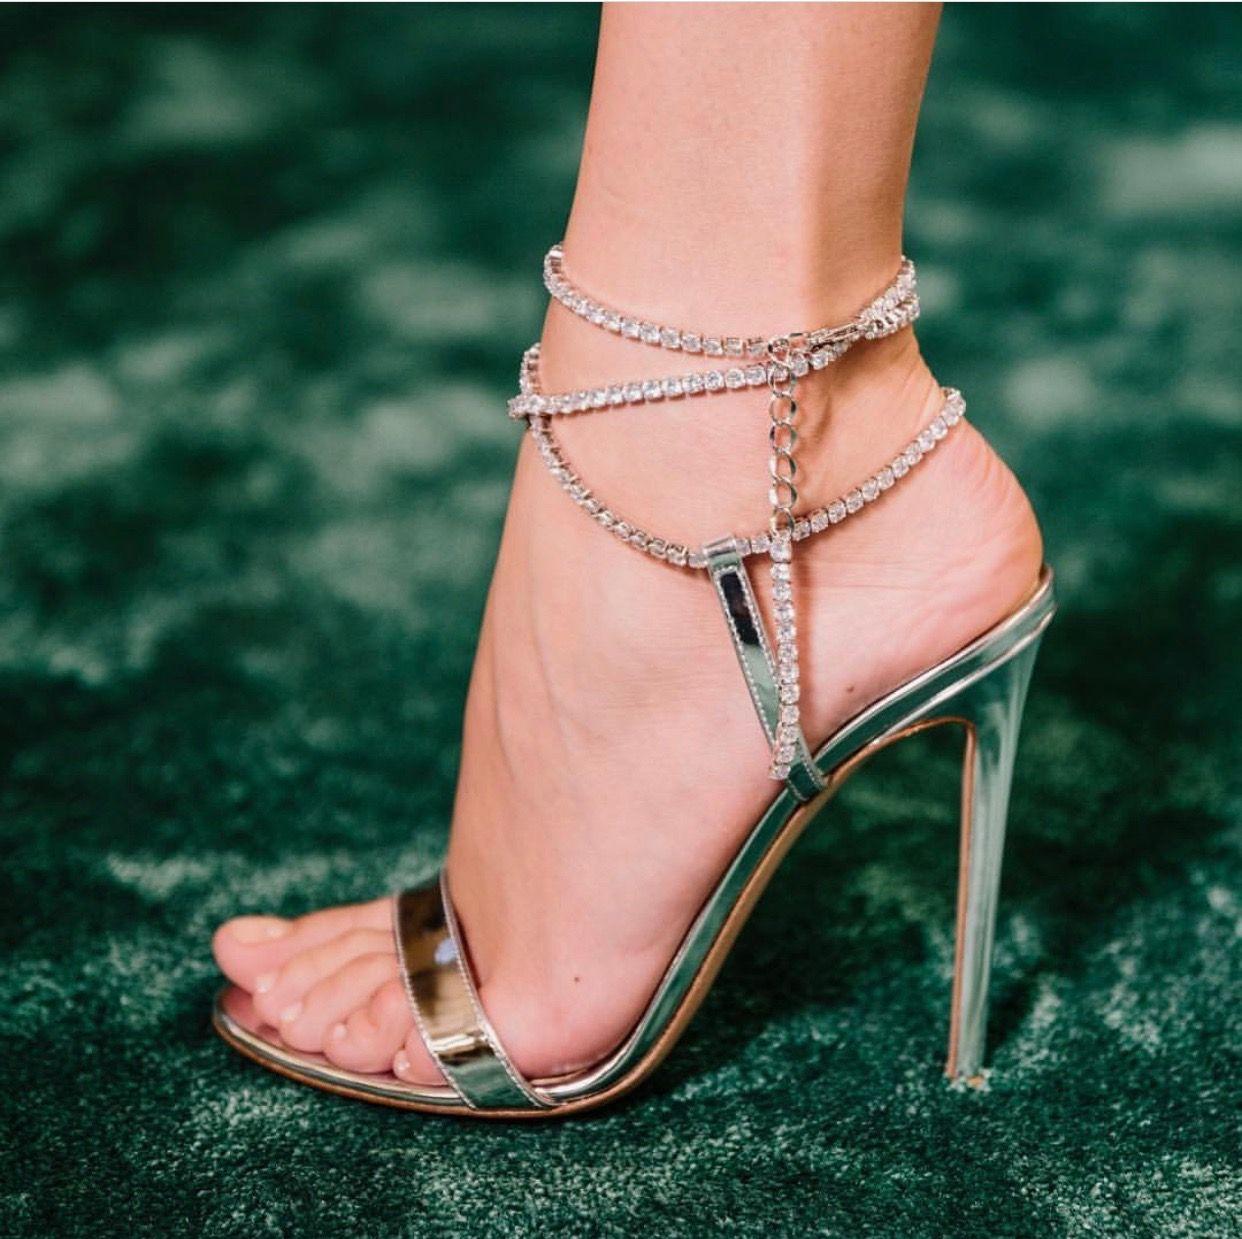 6f0737b2f4b Gianvitorossi Eternity Bracelet Stiletto 2019  shoes  shoesaddict  sandals   zapatos  estilo  fashion  style  vanessacrestto  stiletto